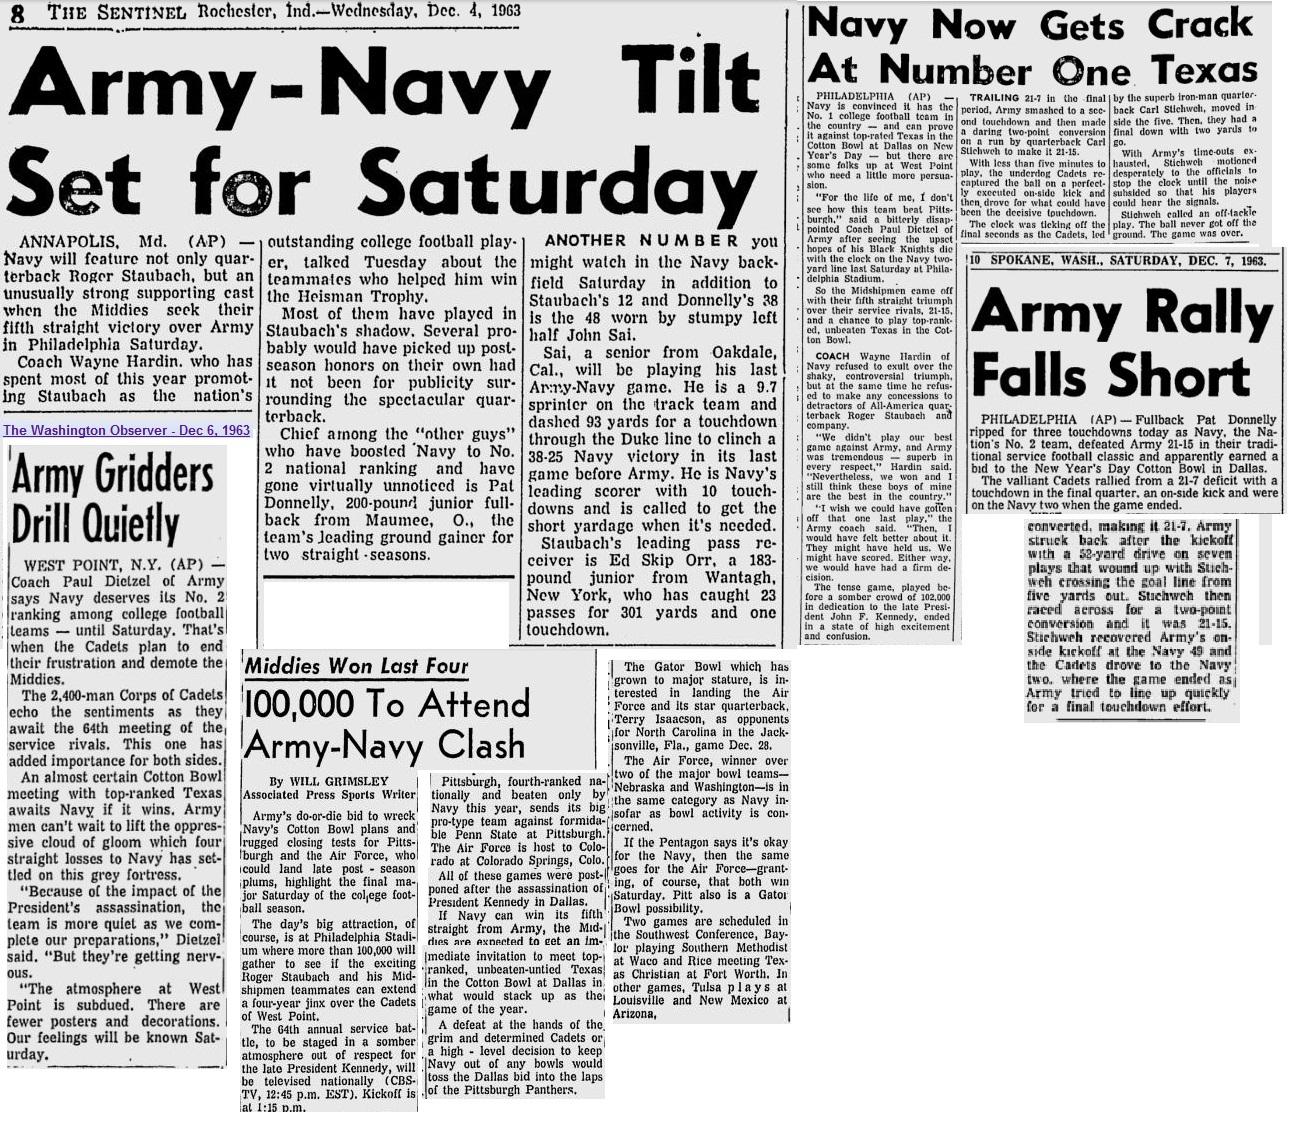 armyfb_1963_vsnavy_rochesterinsentinel_dec41963